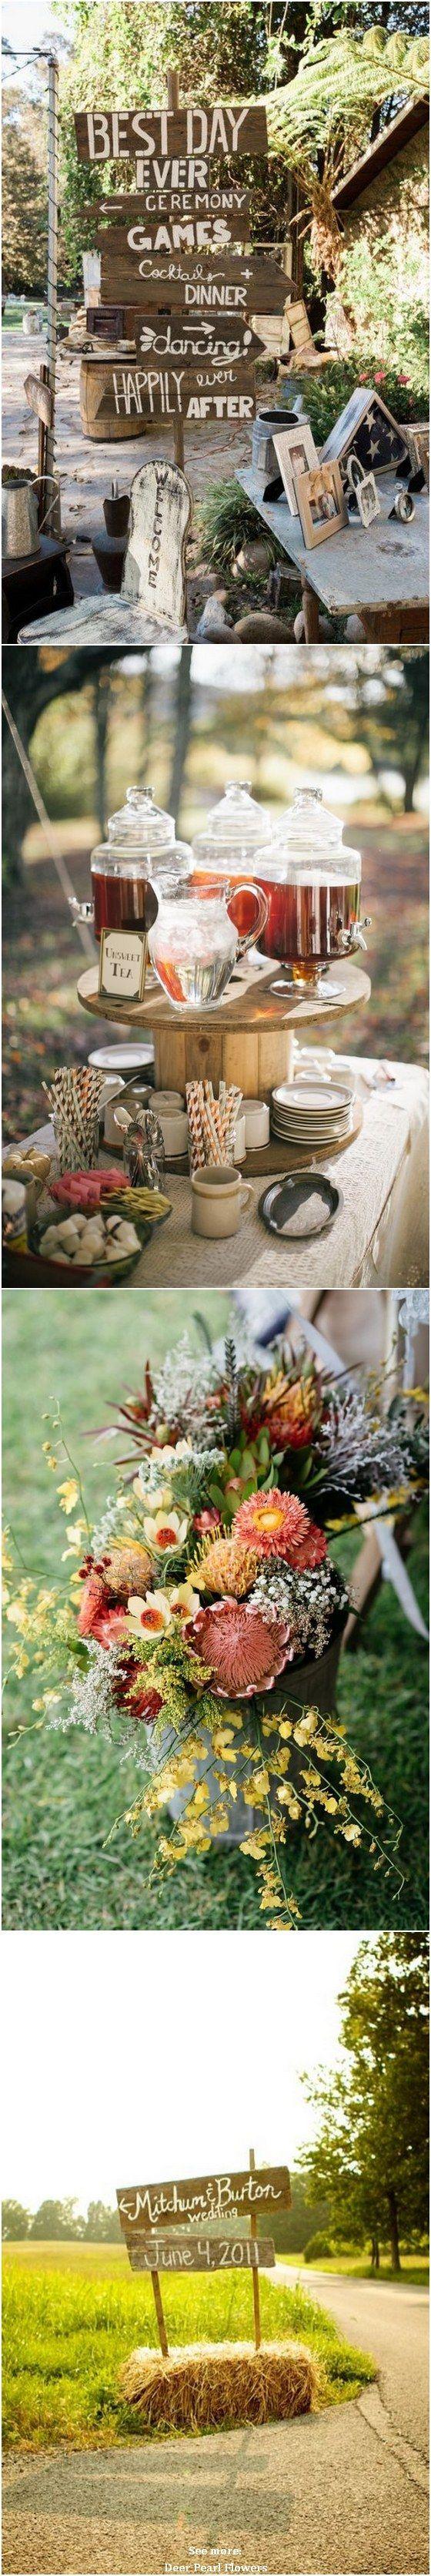 30 Fall U0026 Country Rustic Wedding Theme Ideasu2026